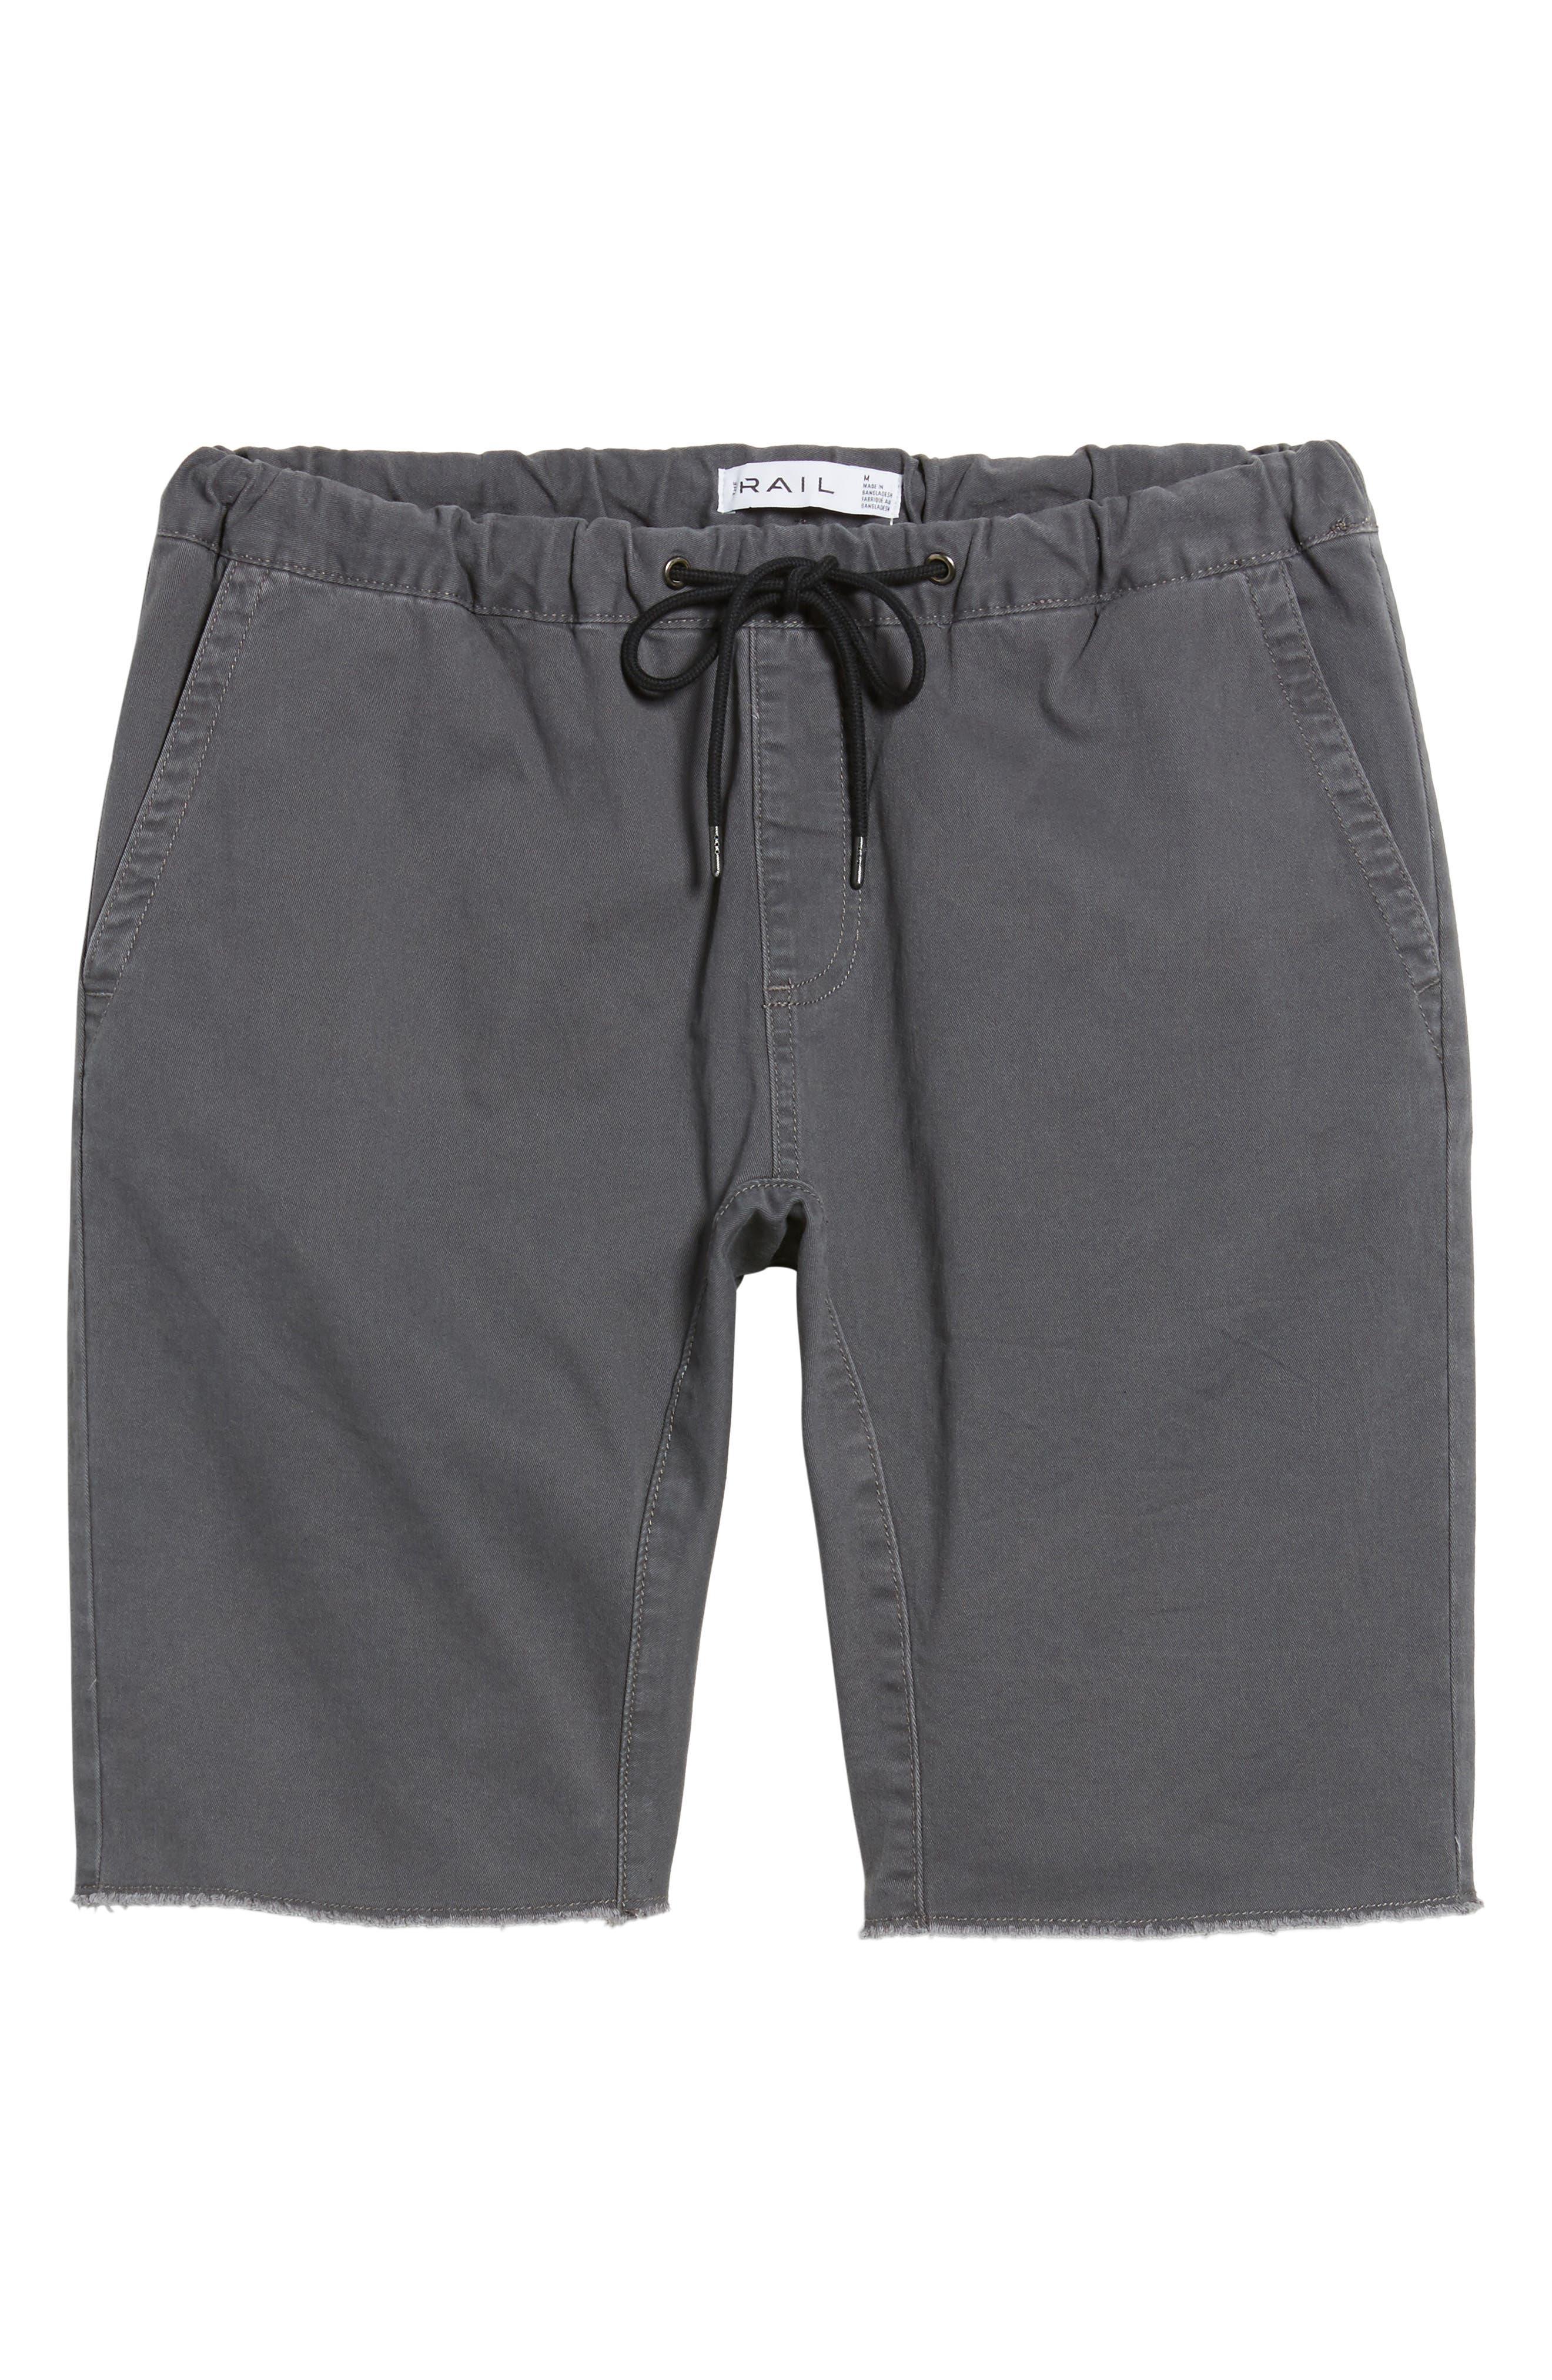 THE RAIL, Jogger Shorts, Alternate thumbnail 6, color, GREY ONYX